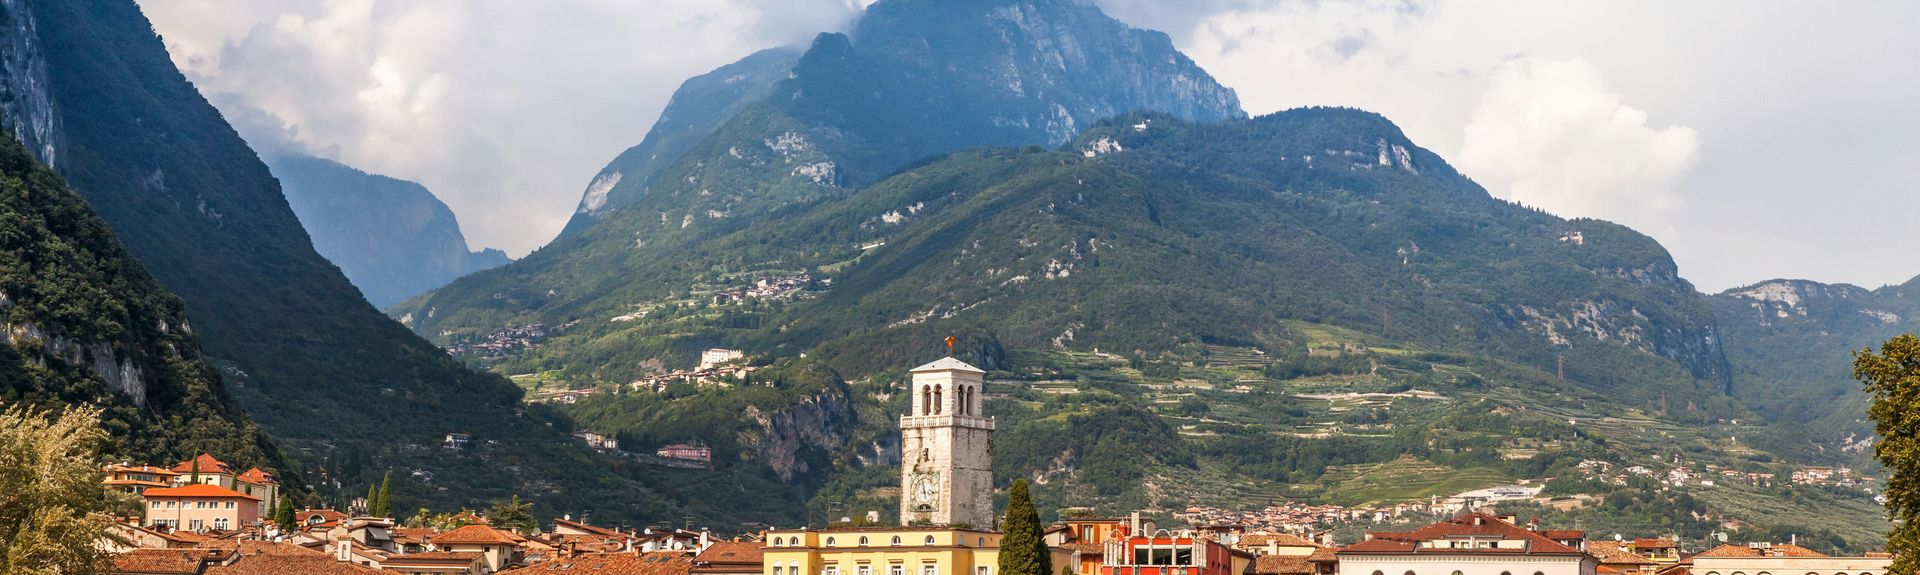 Lombardia, Italia